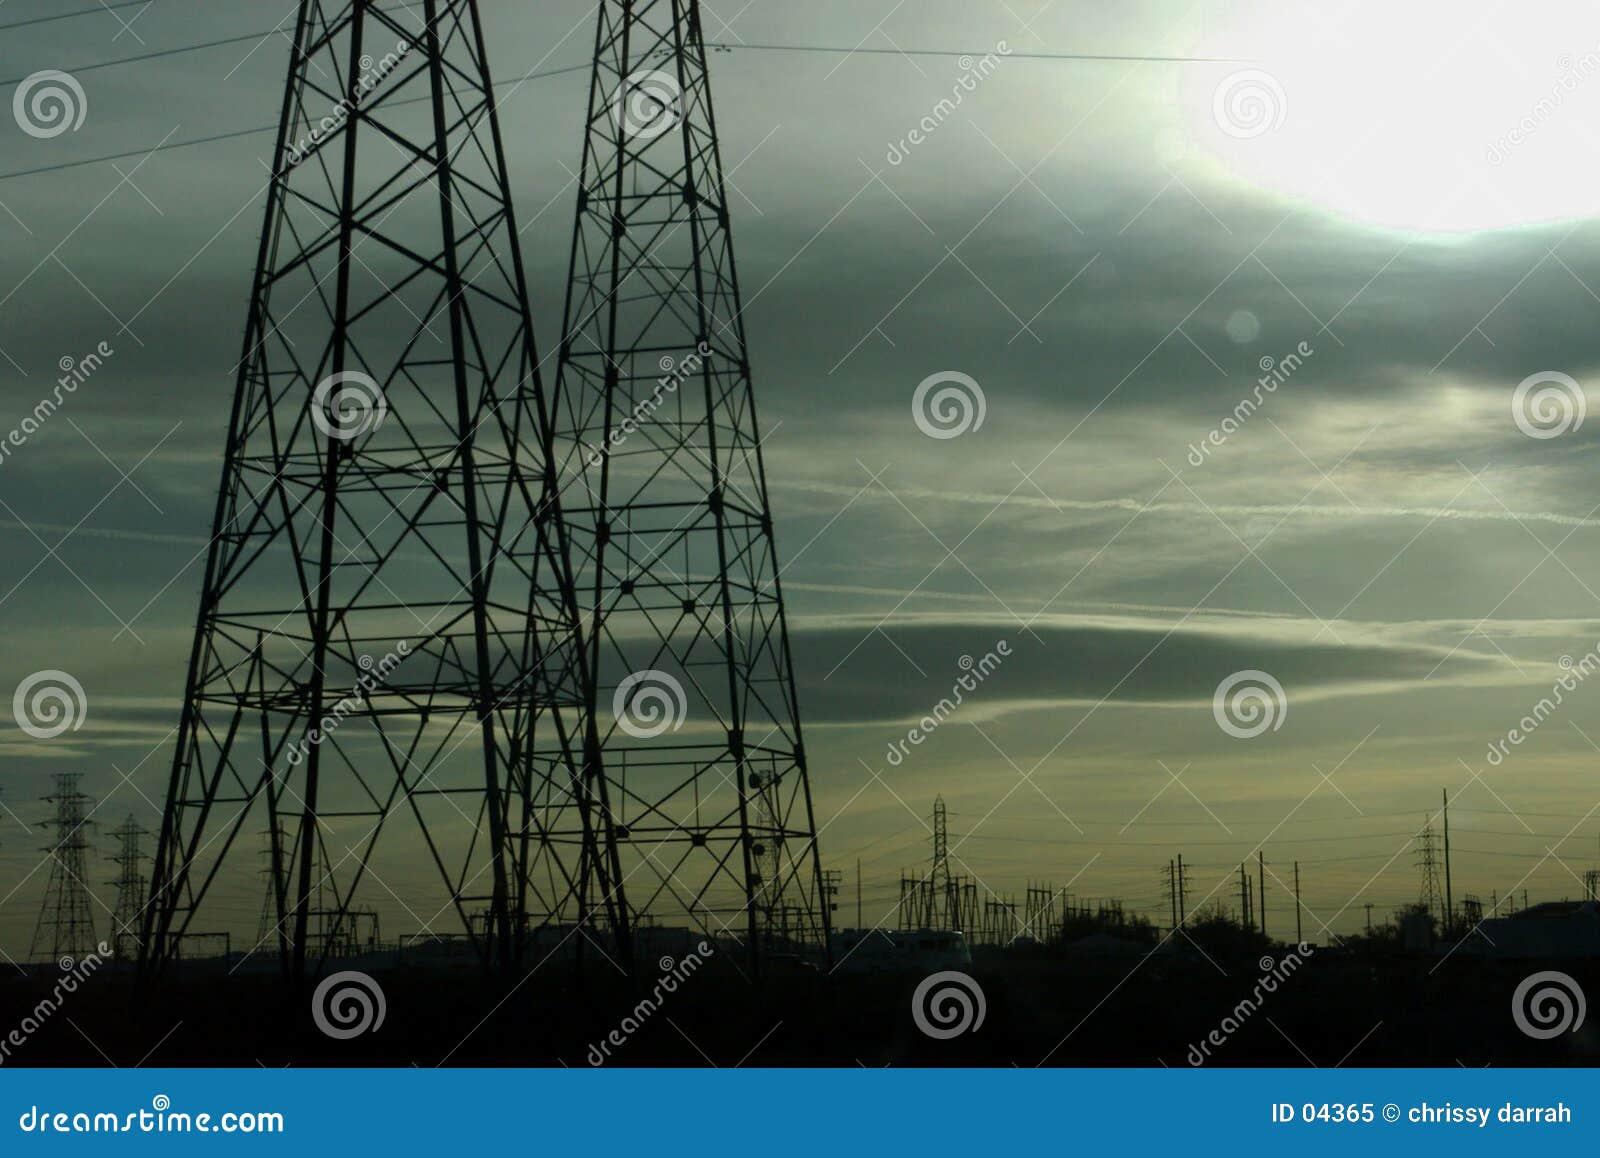 Oscuridad eléctrica